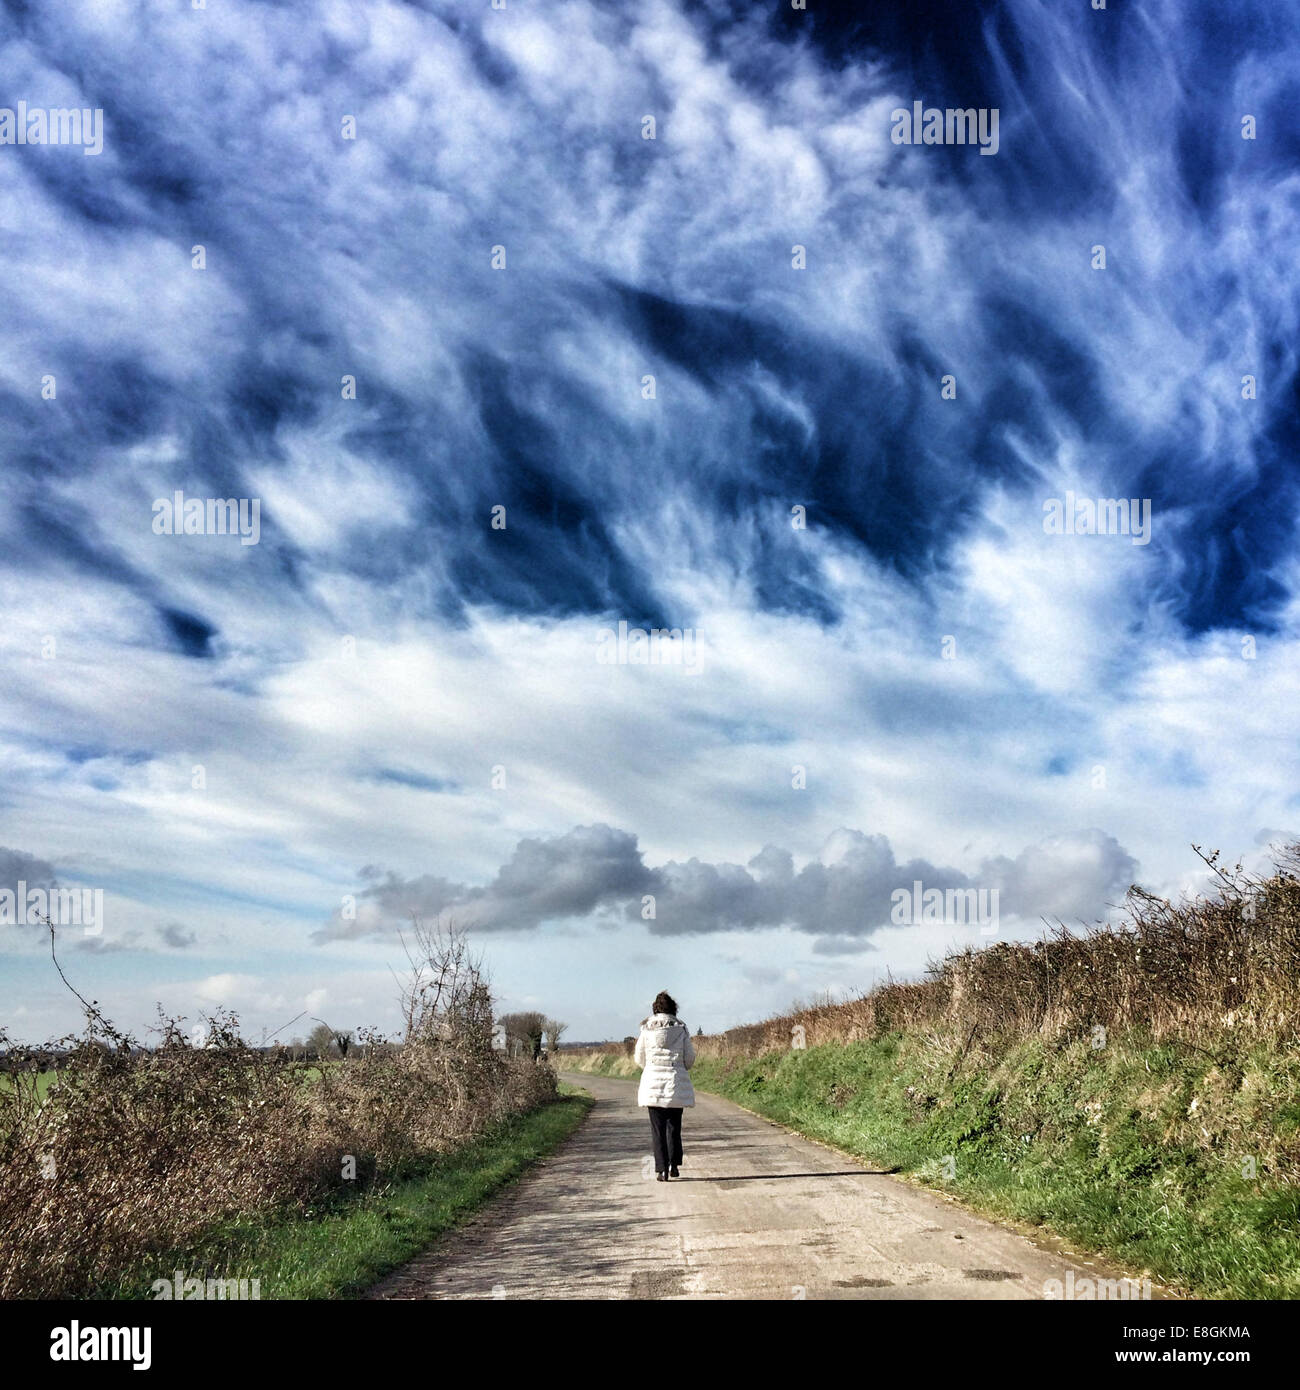 Woman walking down path - Stock Image